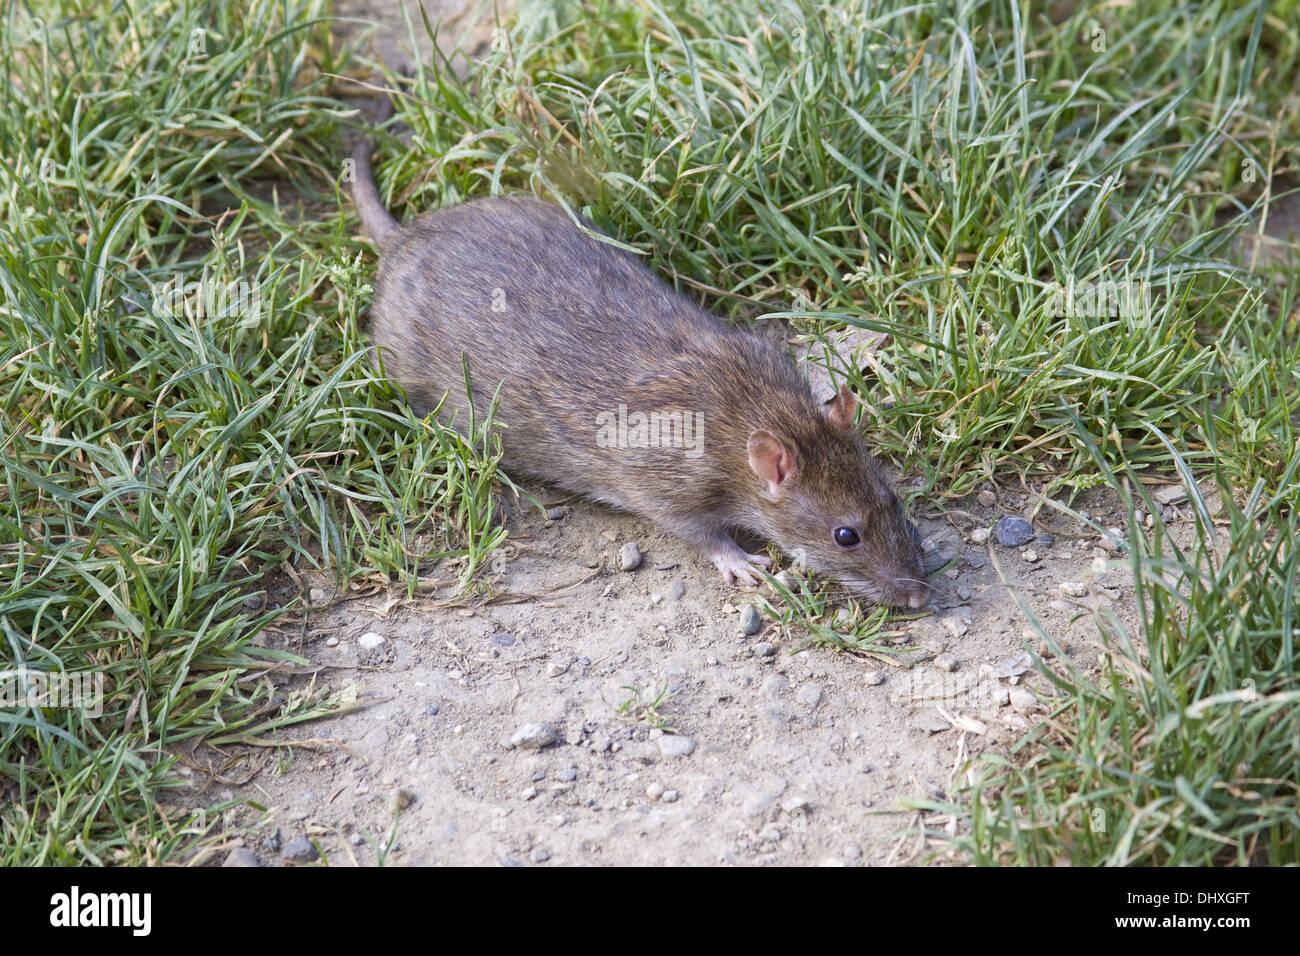 Brown Norway rat - Stock Image